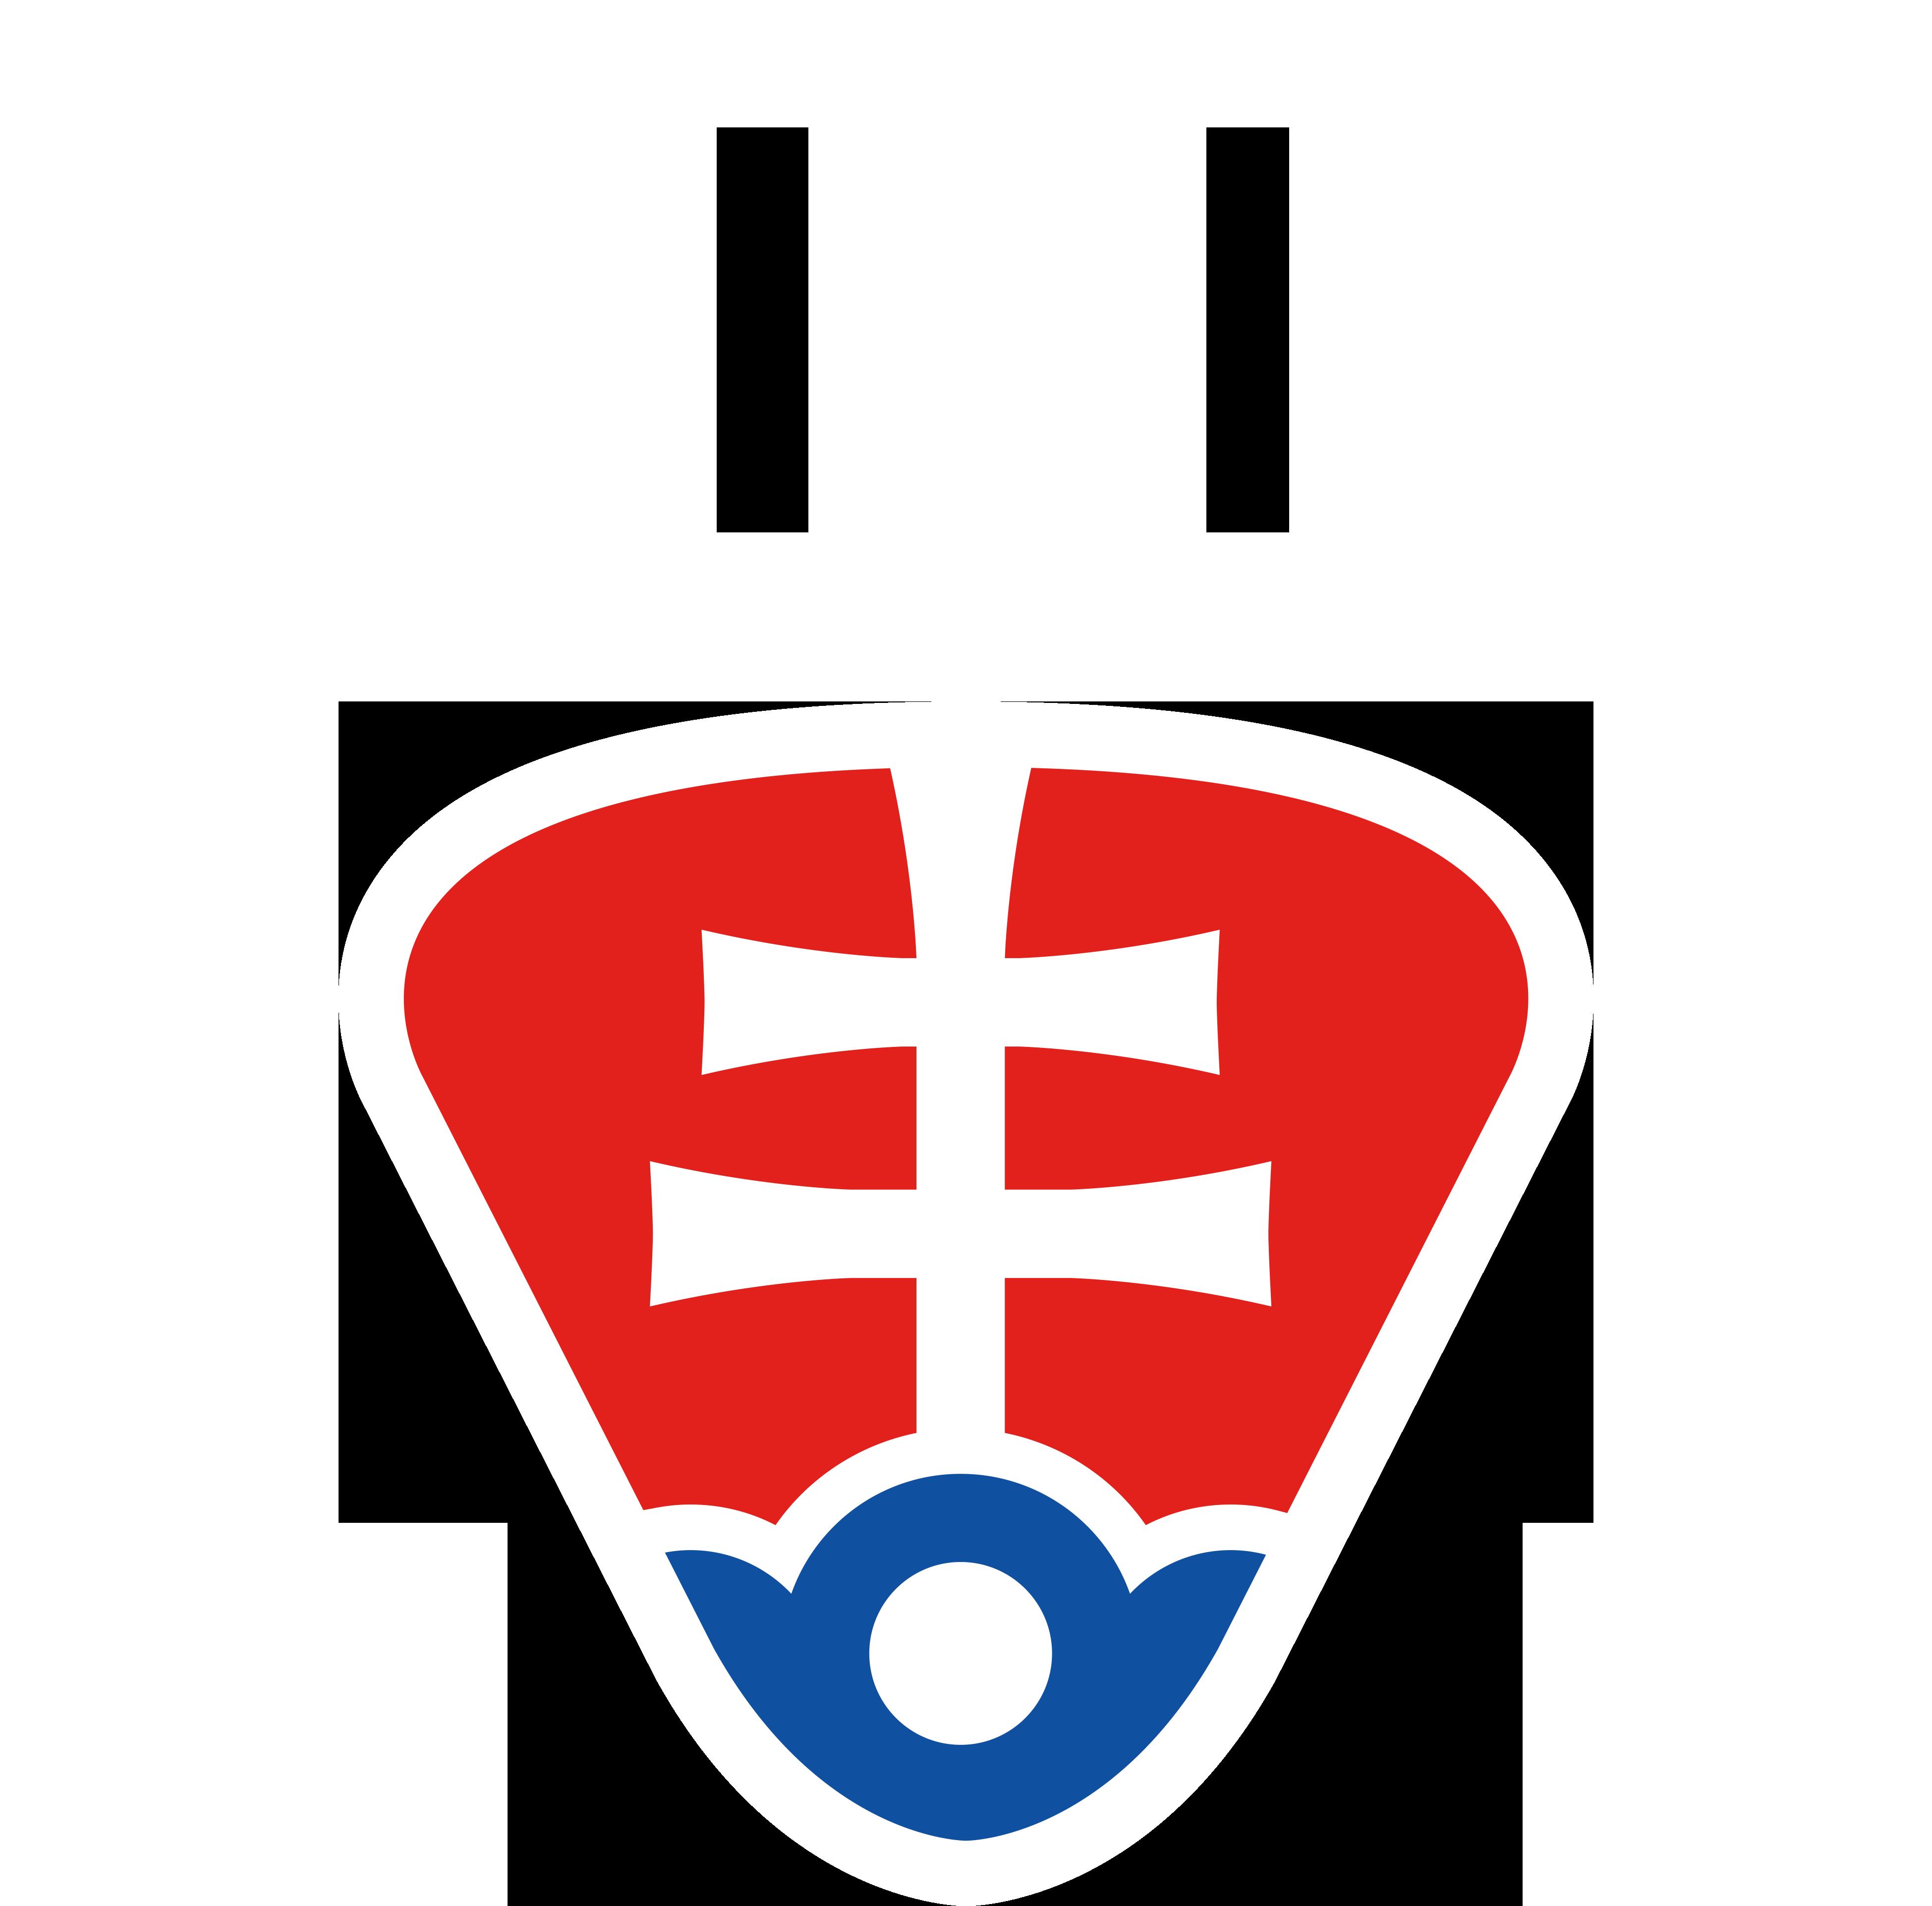 SLOVAK LACROSSE FEDERATION